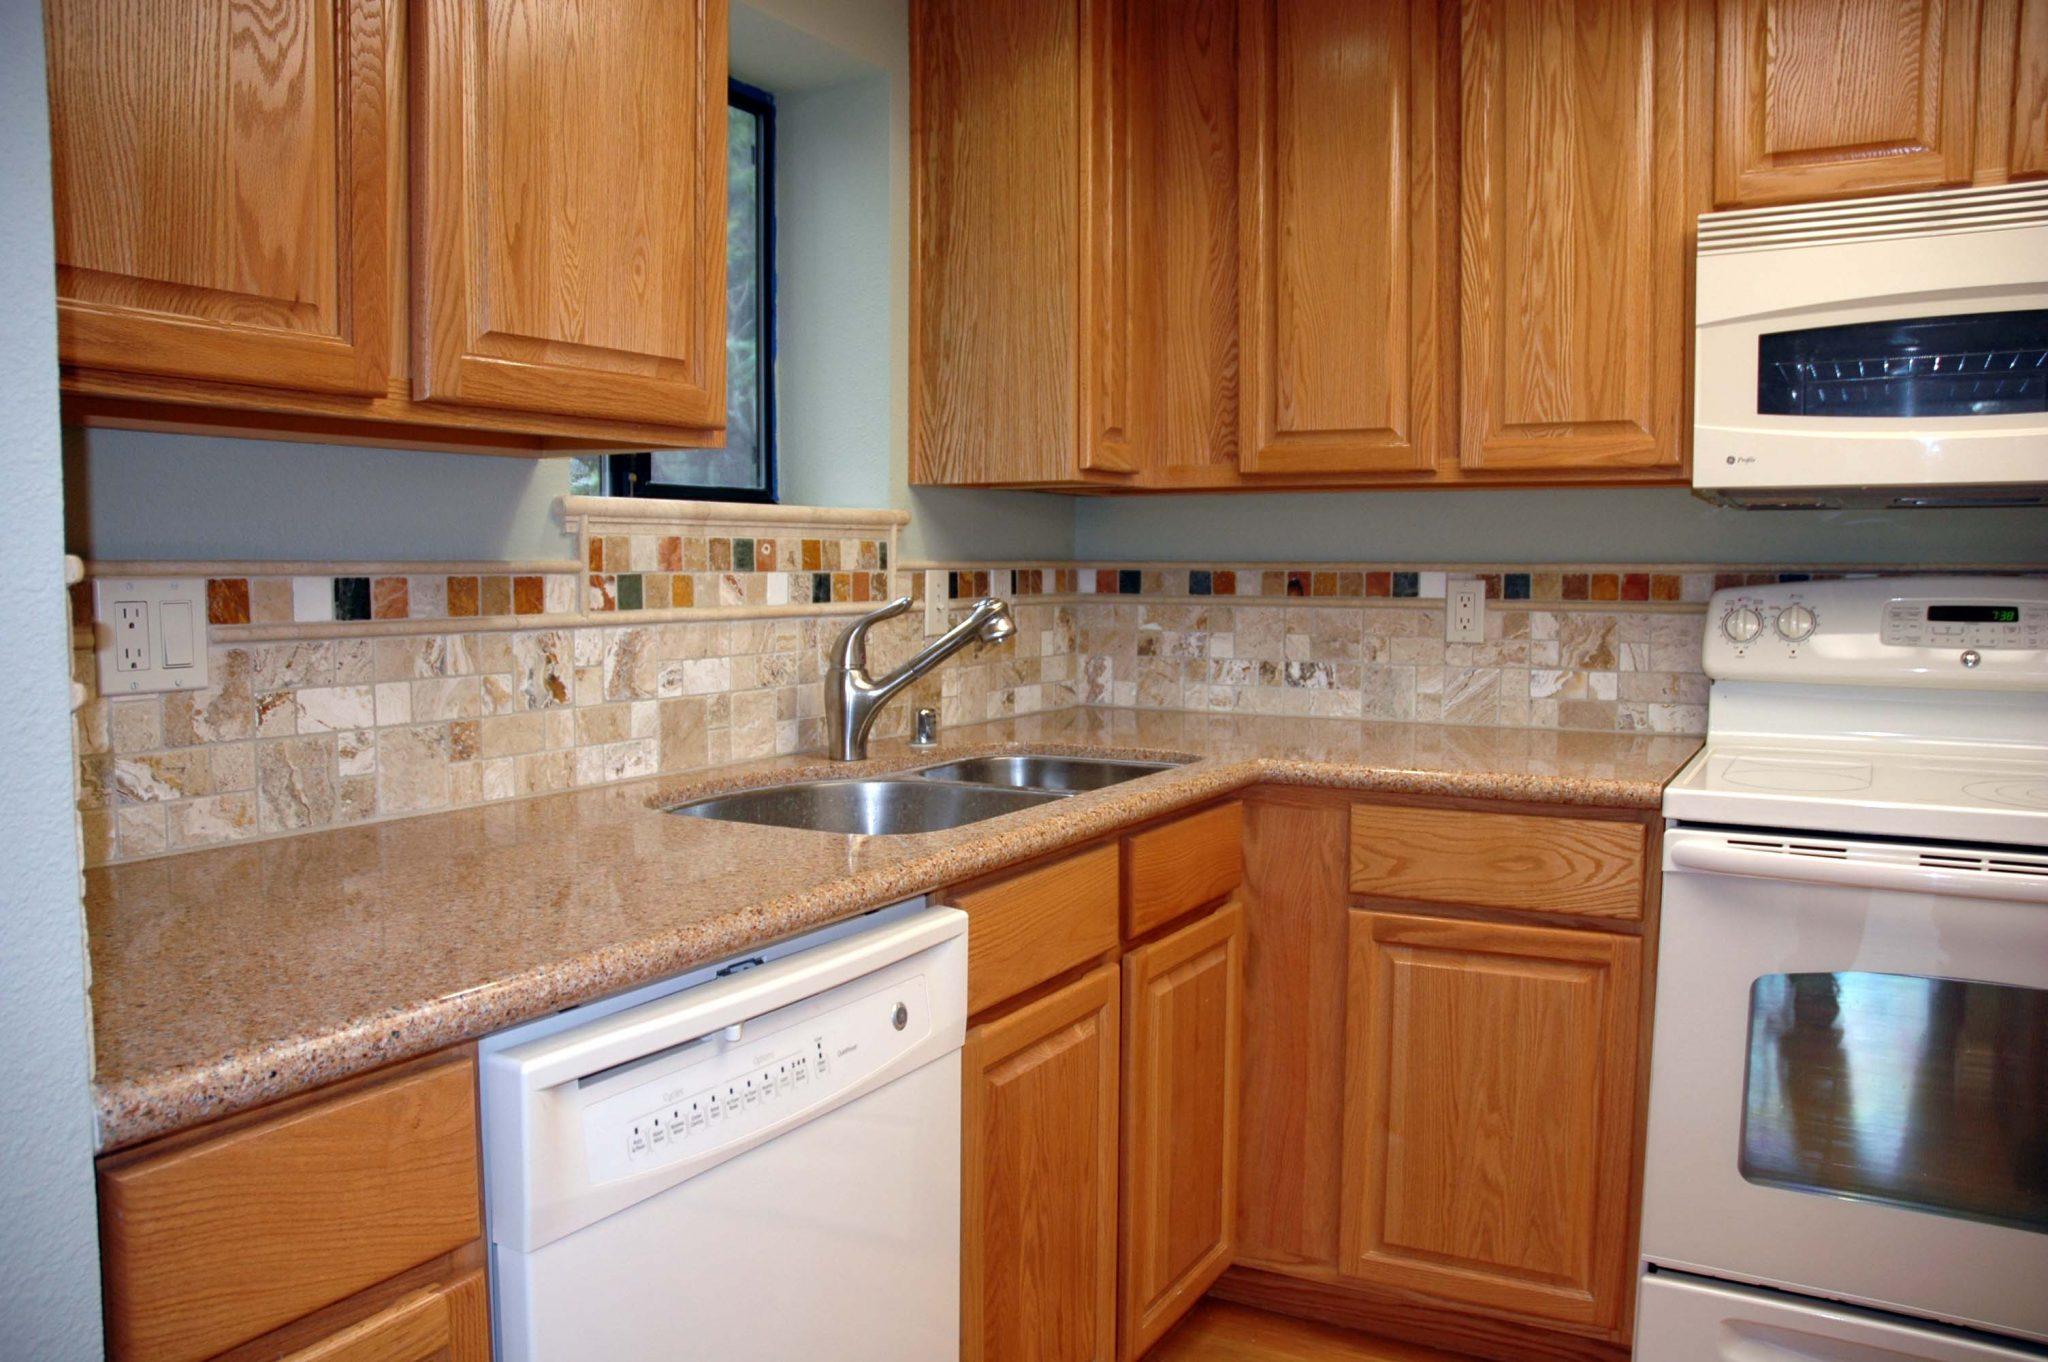 kitchen cabinets backsplash ideas photo - 10